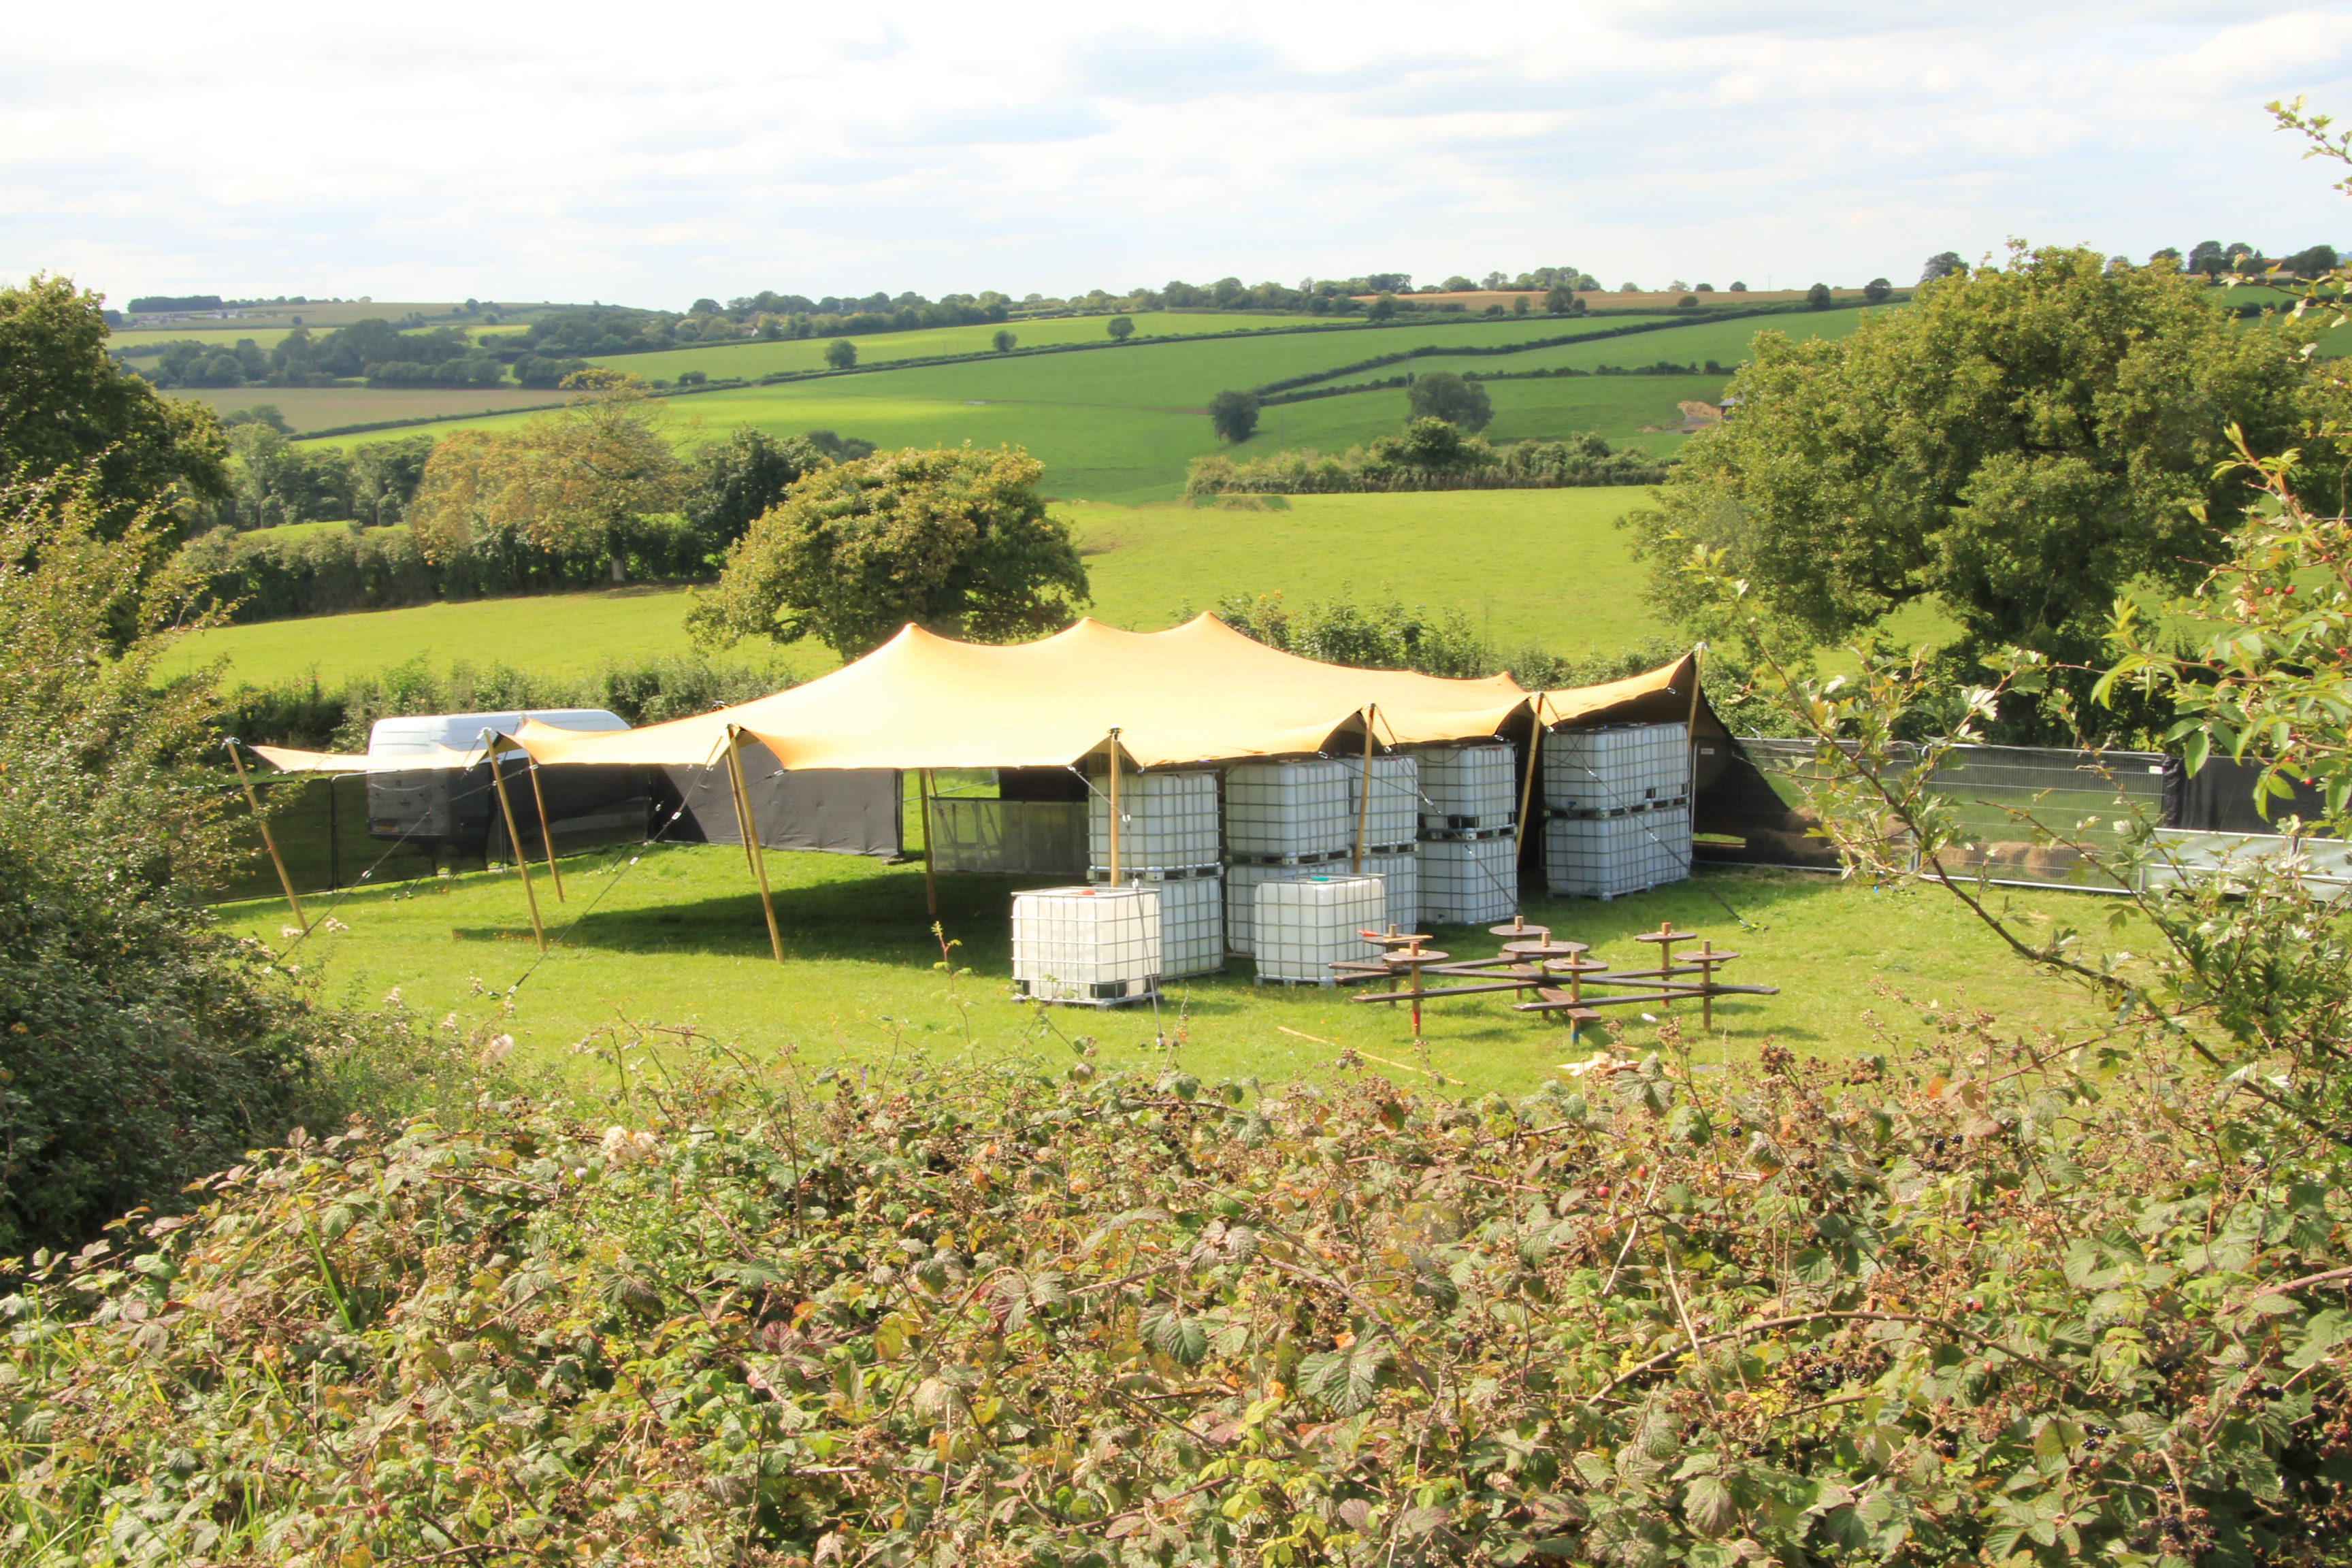 Field Trip Festival Tent